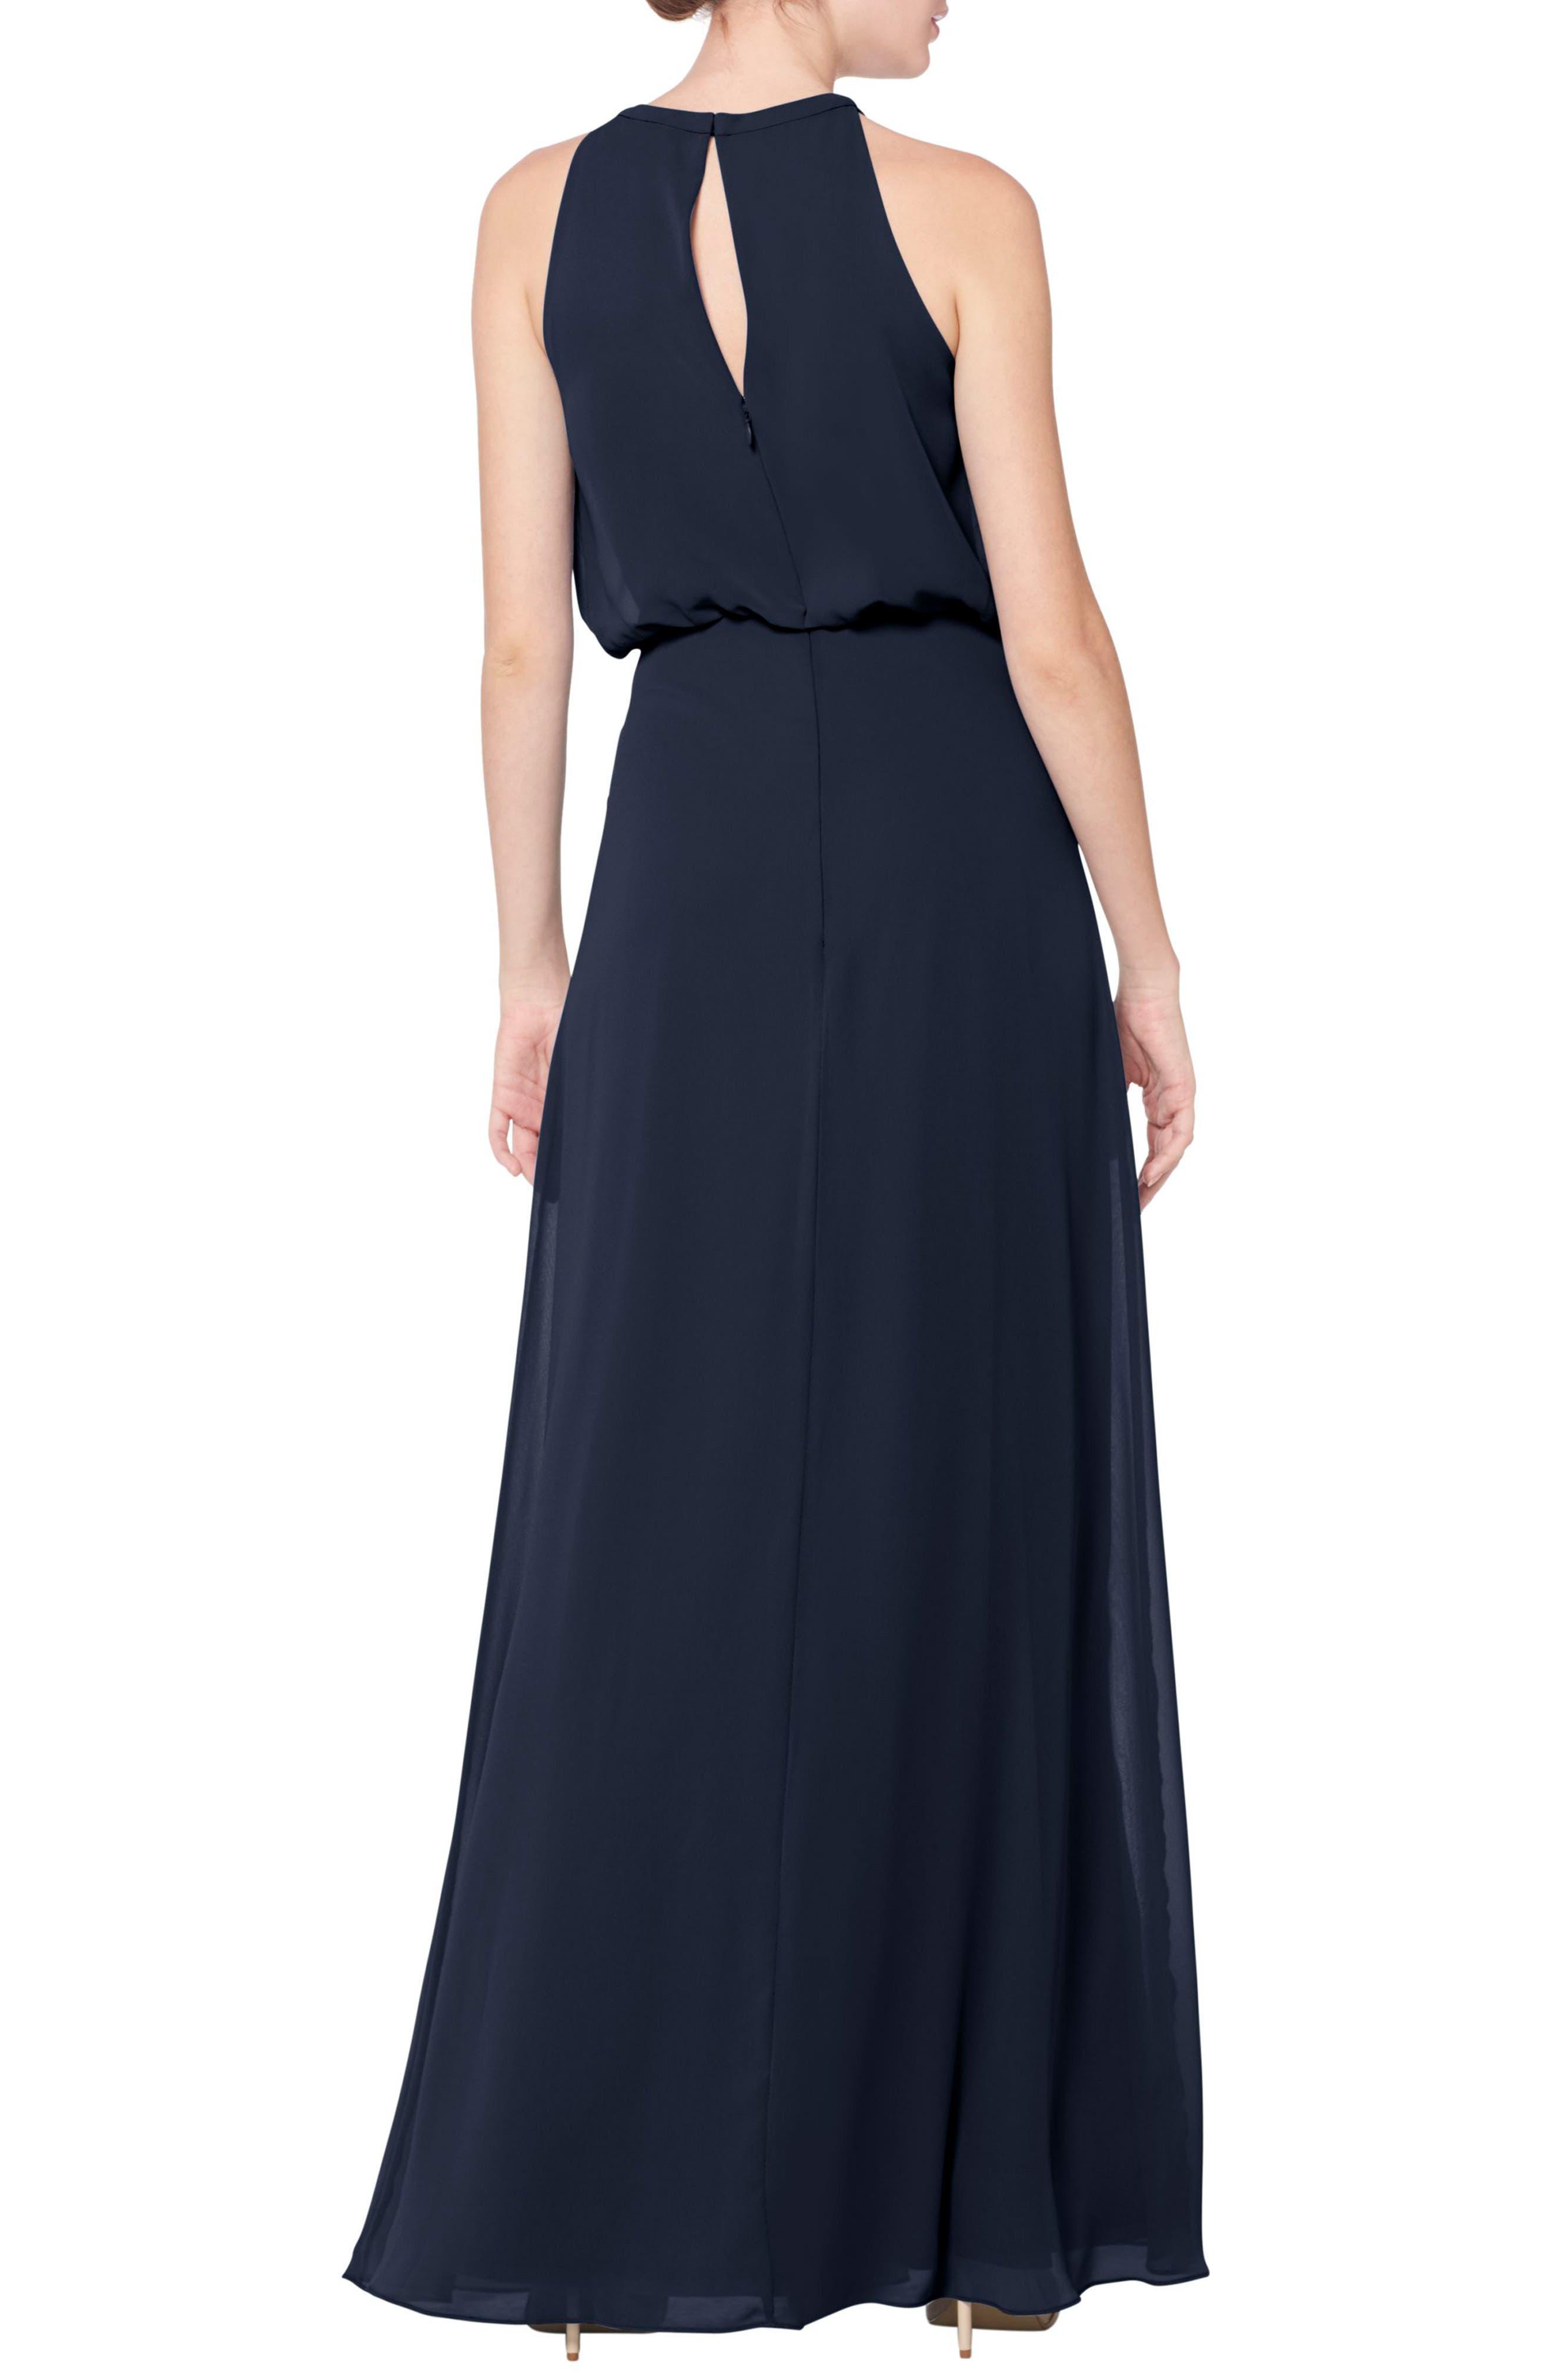 #LEVKOFF, Halter Neck Blouson Bodice Chiffon Evening Dress, Alternate thumbnail 2, color, NAVY